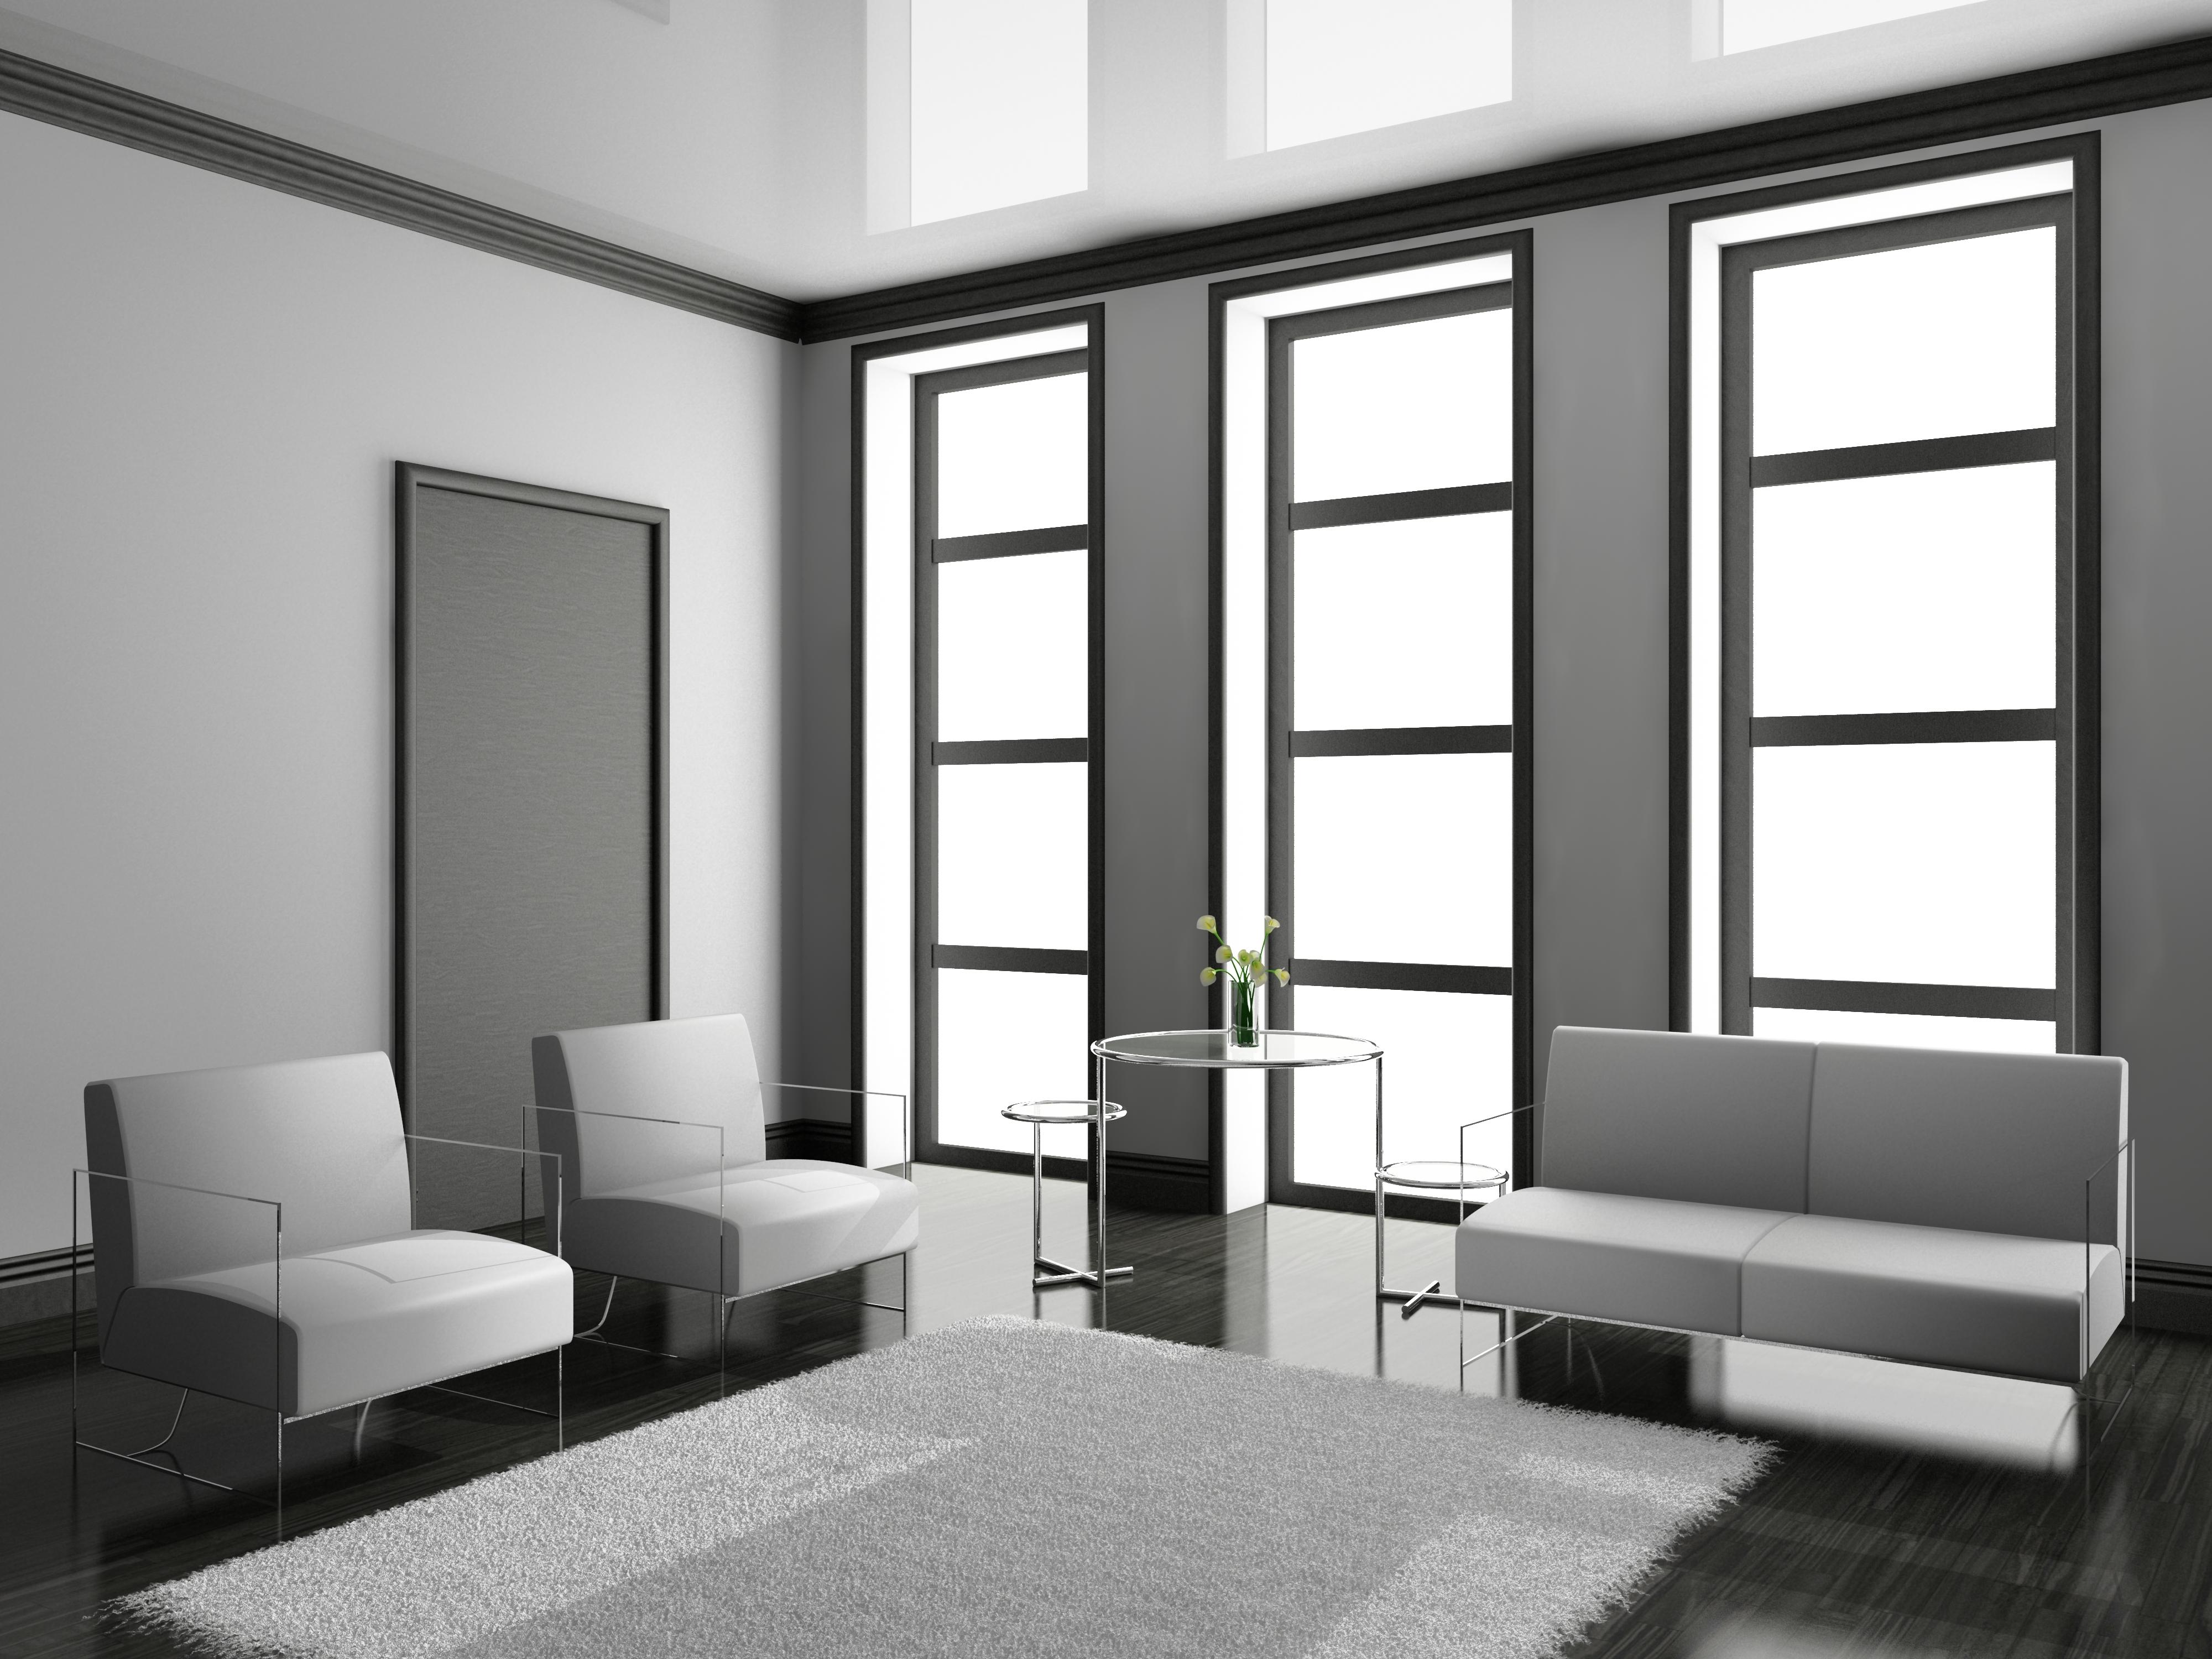 sols et murs agrandir votre int rev tements peintures murs sols. Black Bedroom Furniture Sets. Home Design Ideas